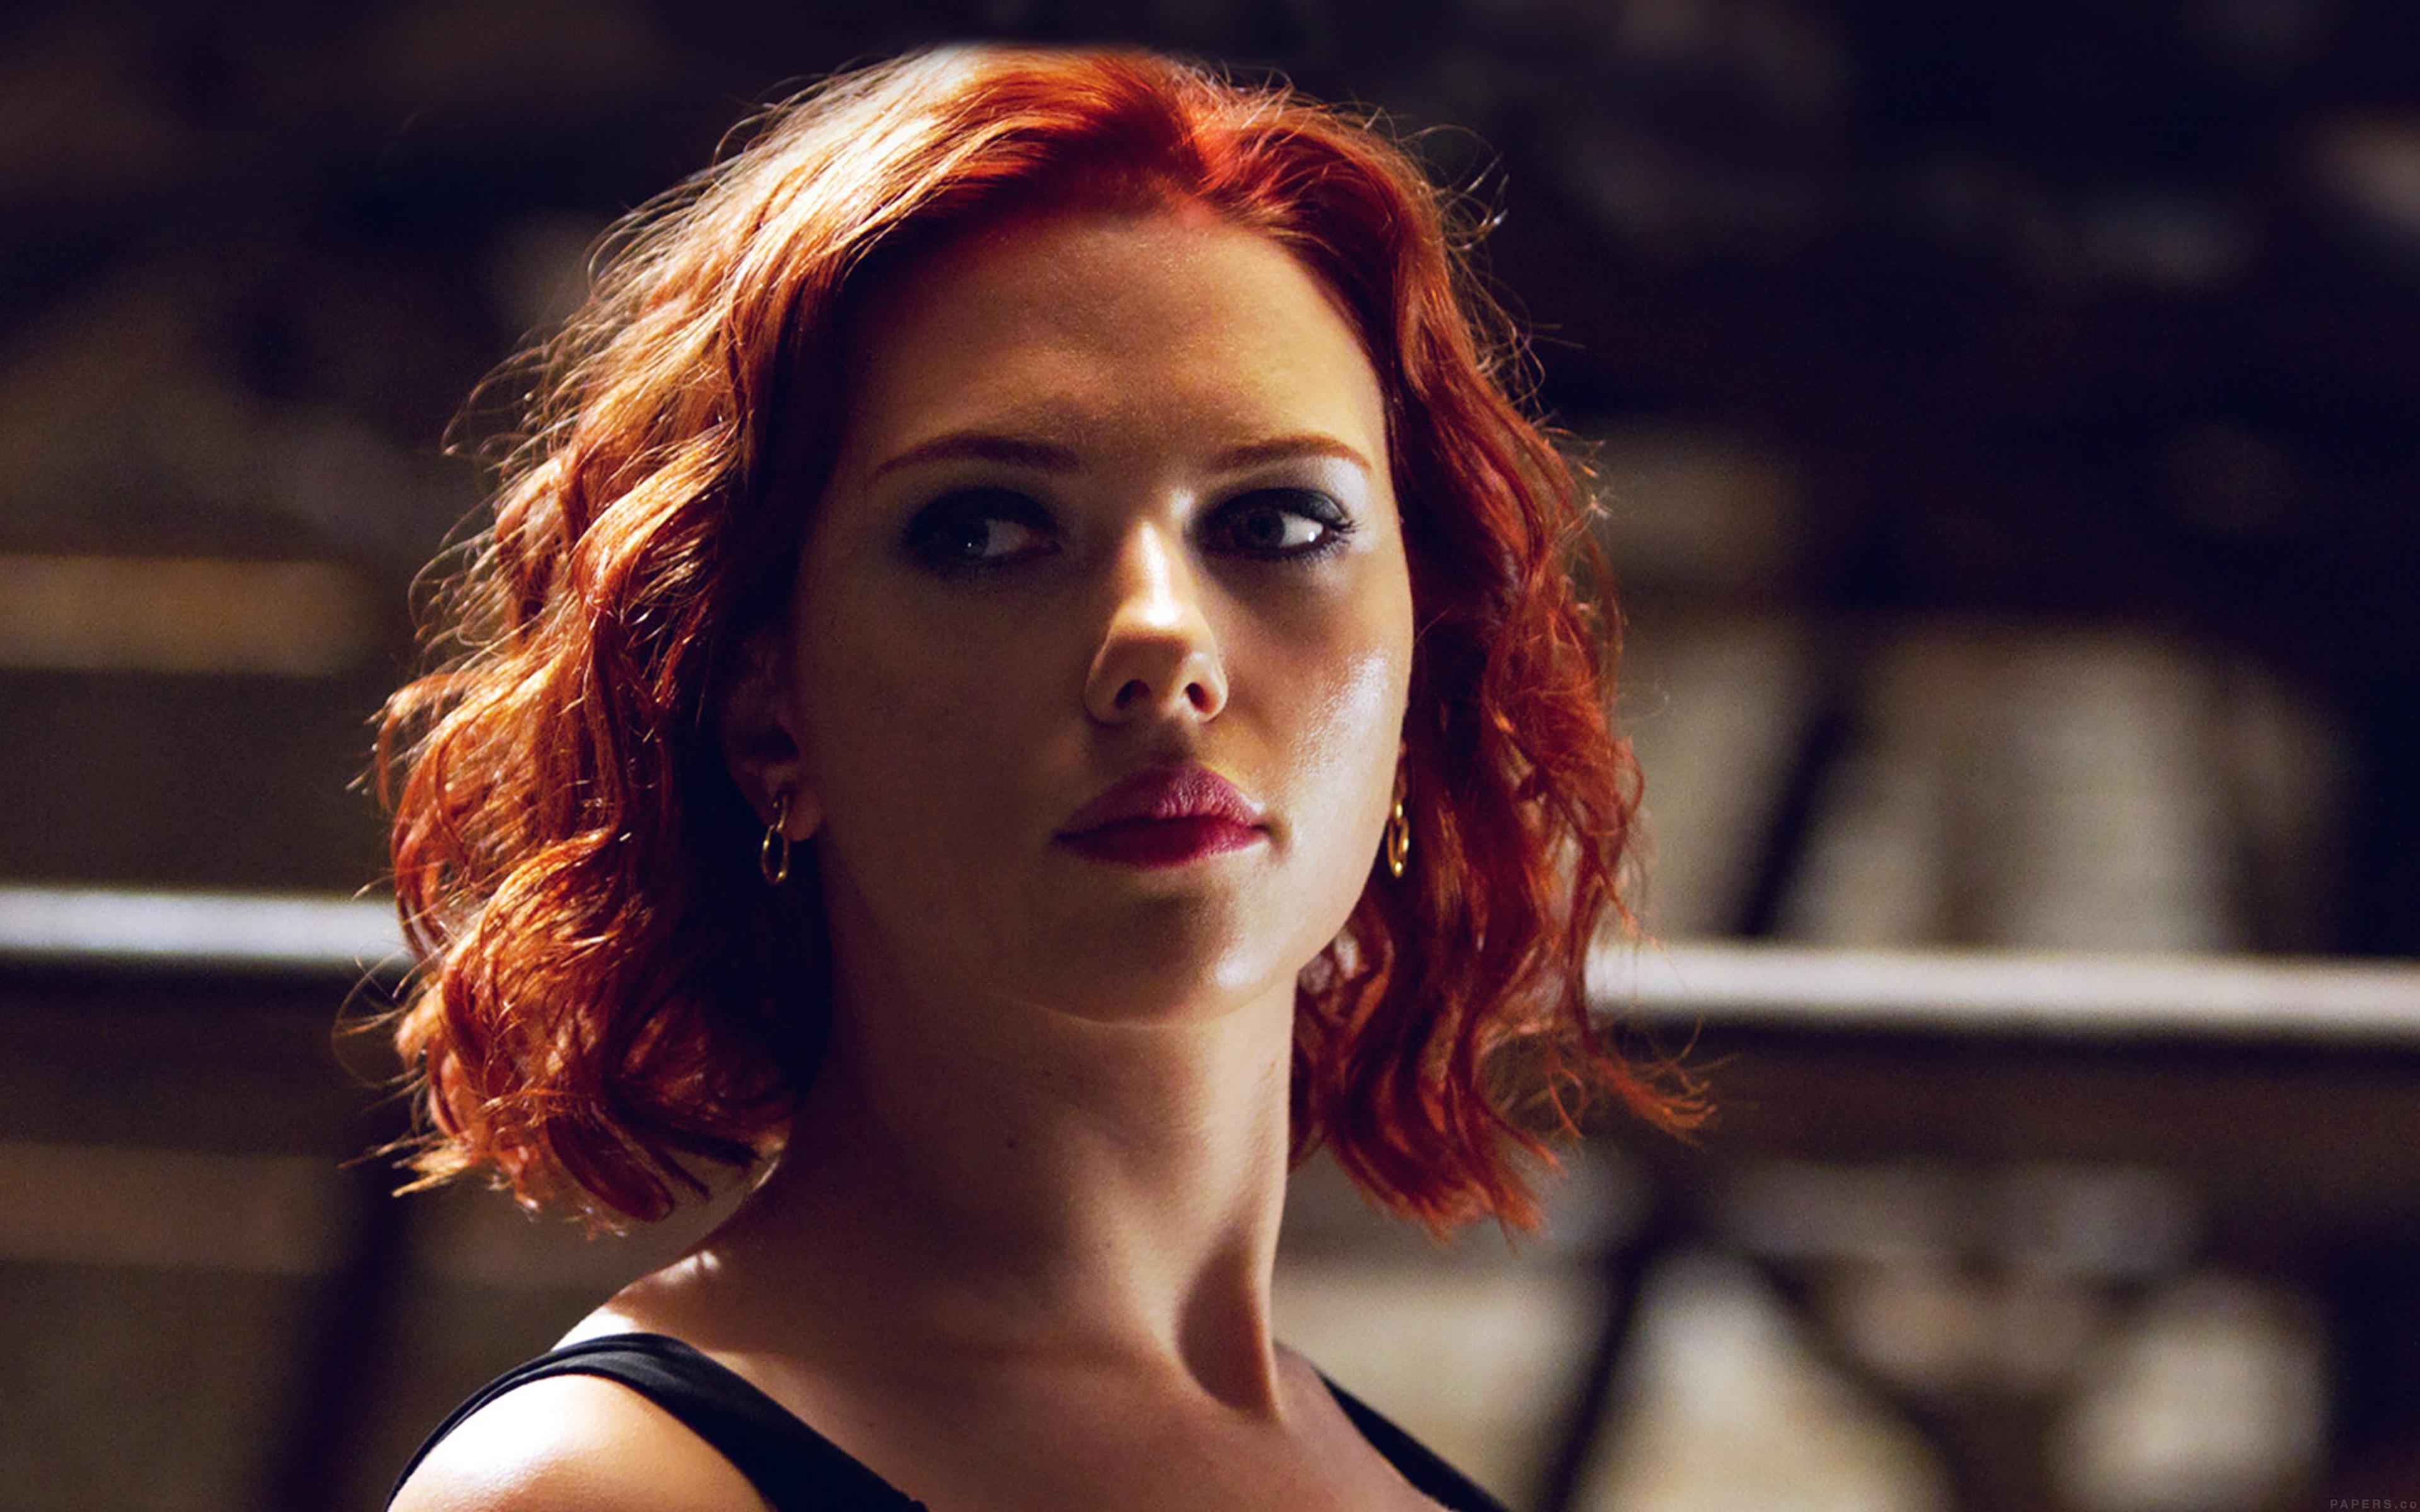 Hf29 Avengers Natasha Scarlett Johansson Sexy Hero